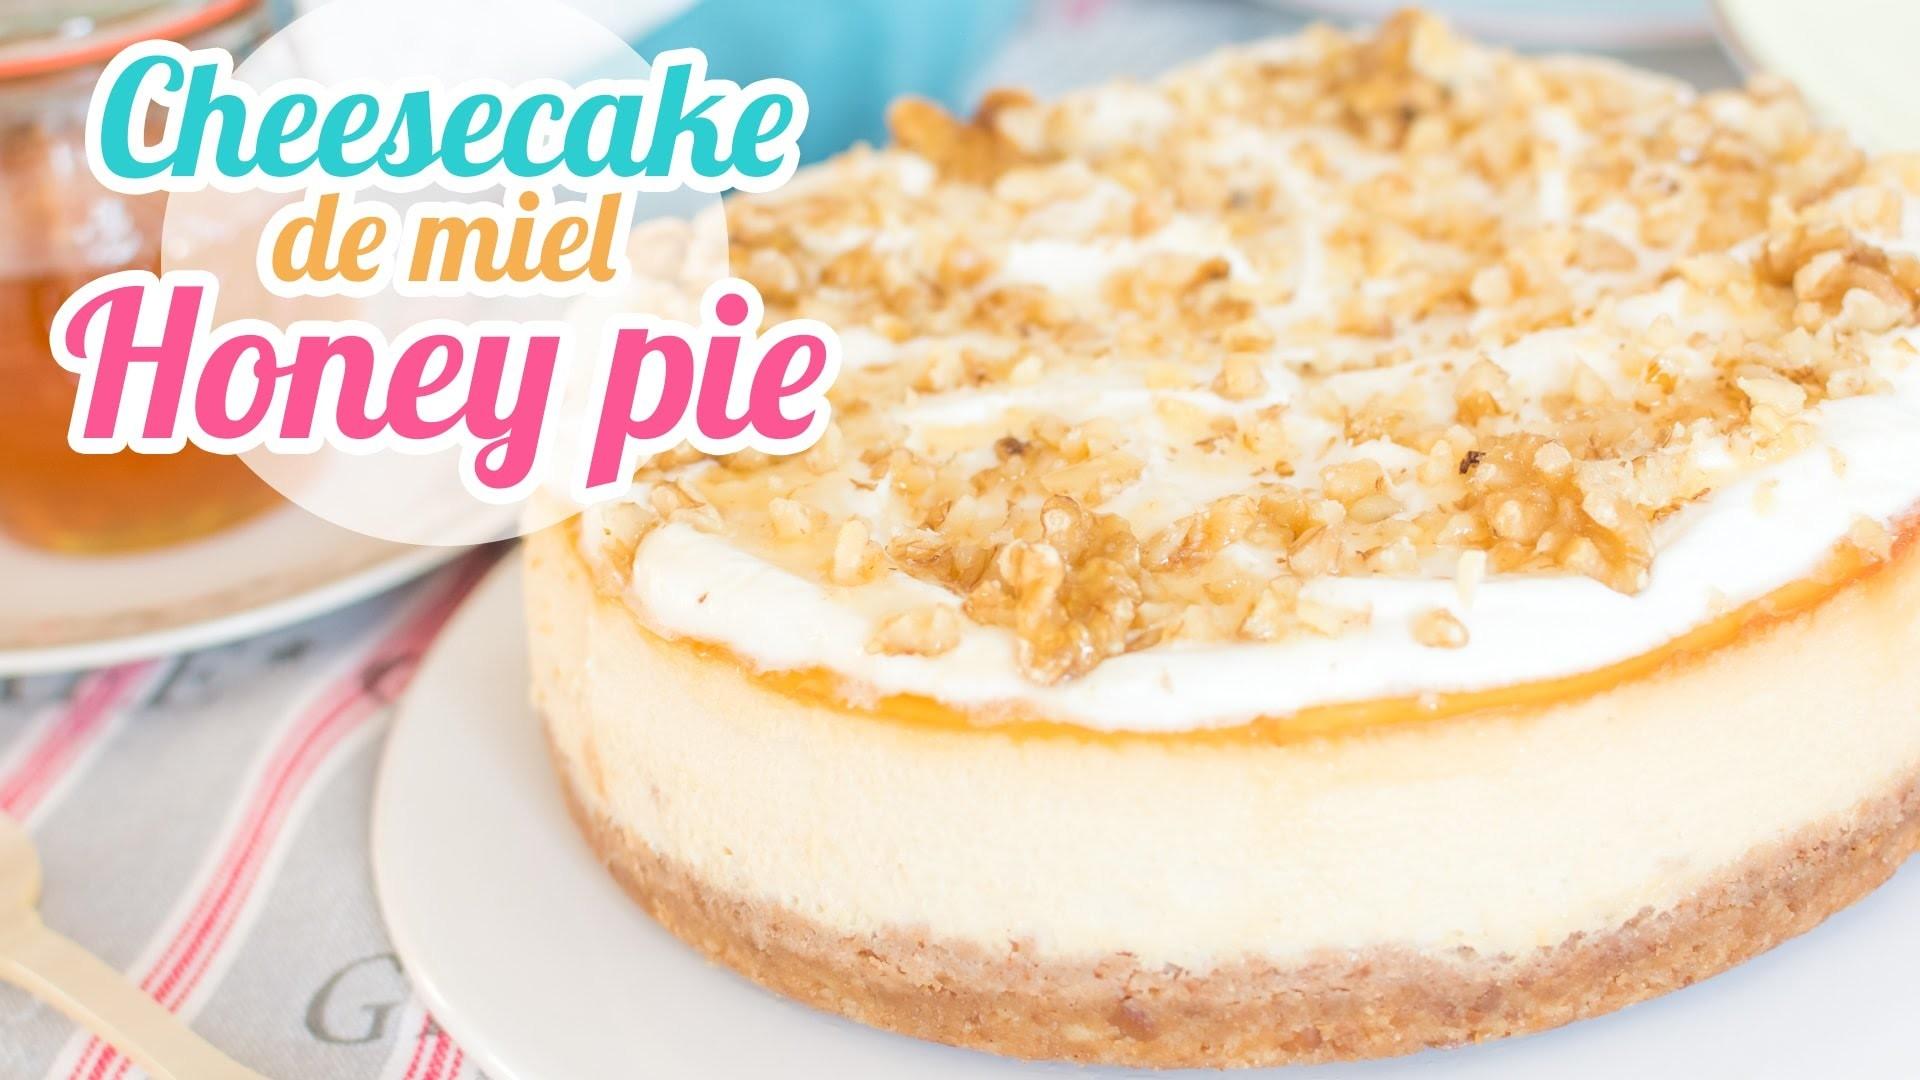 Cheesecake de Miel o Honey pie | Desafío de ingredientes con Cocina para todos